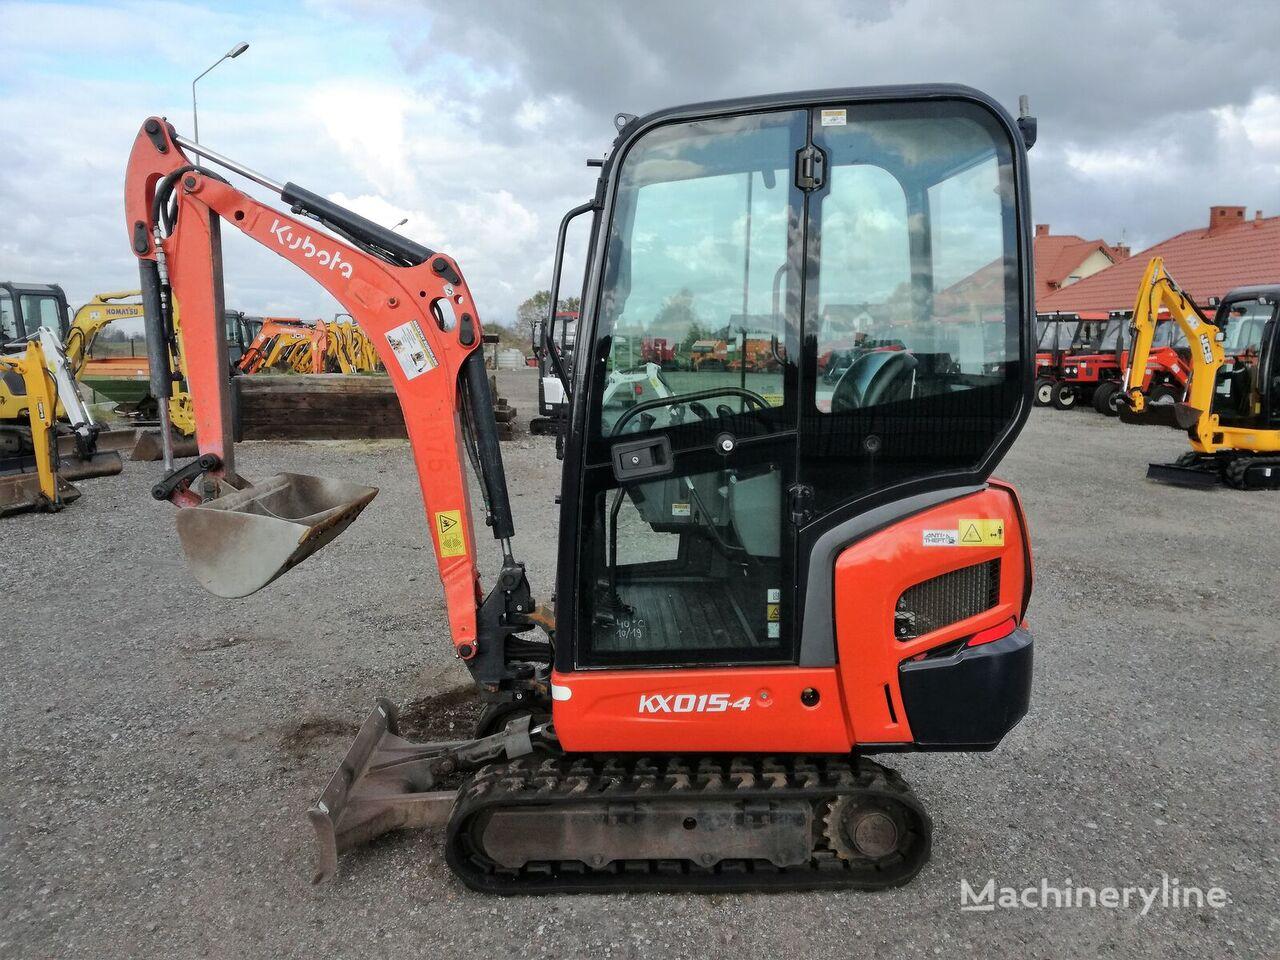 KOMATSU KX 015-4 , 2012r  016-4 018-4 mini excavator